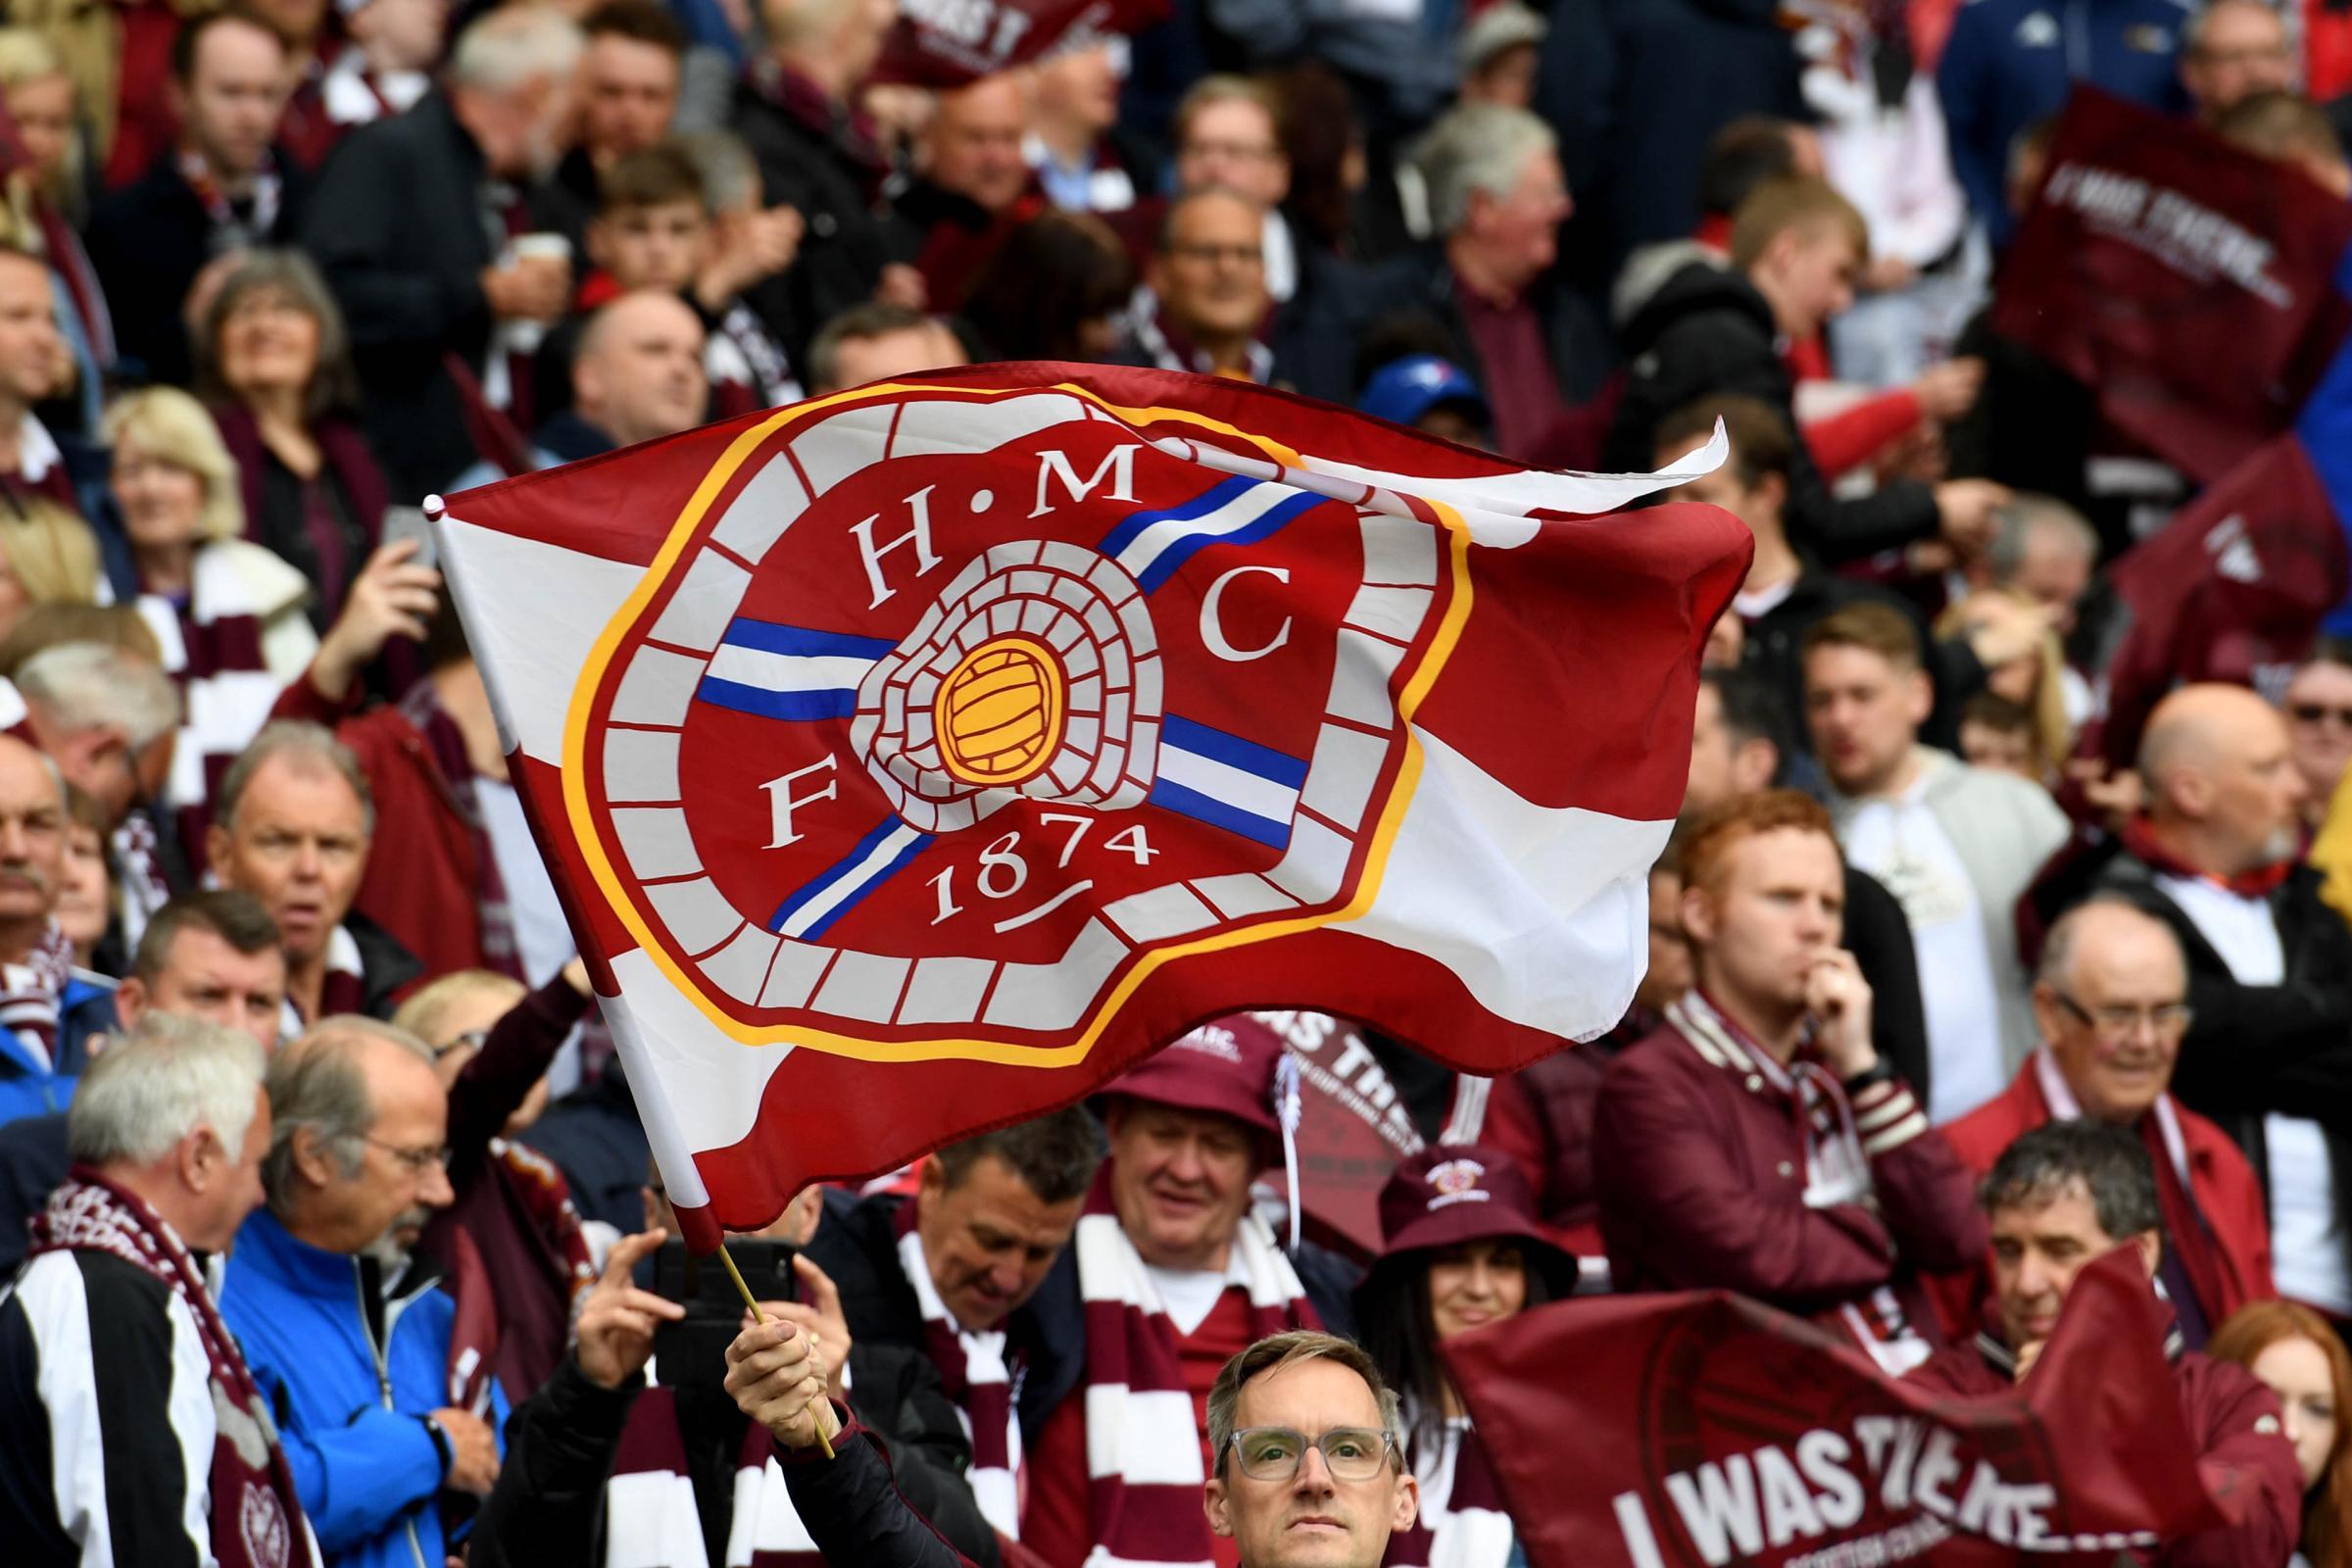 Celtic vs Hearts: Reason Jambos won't have fans inside Parkhead despite full capacity green-light